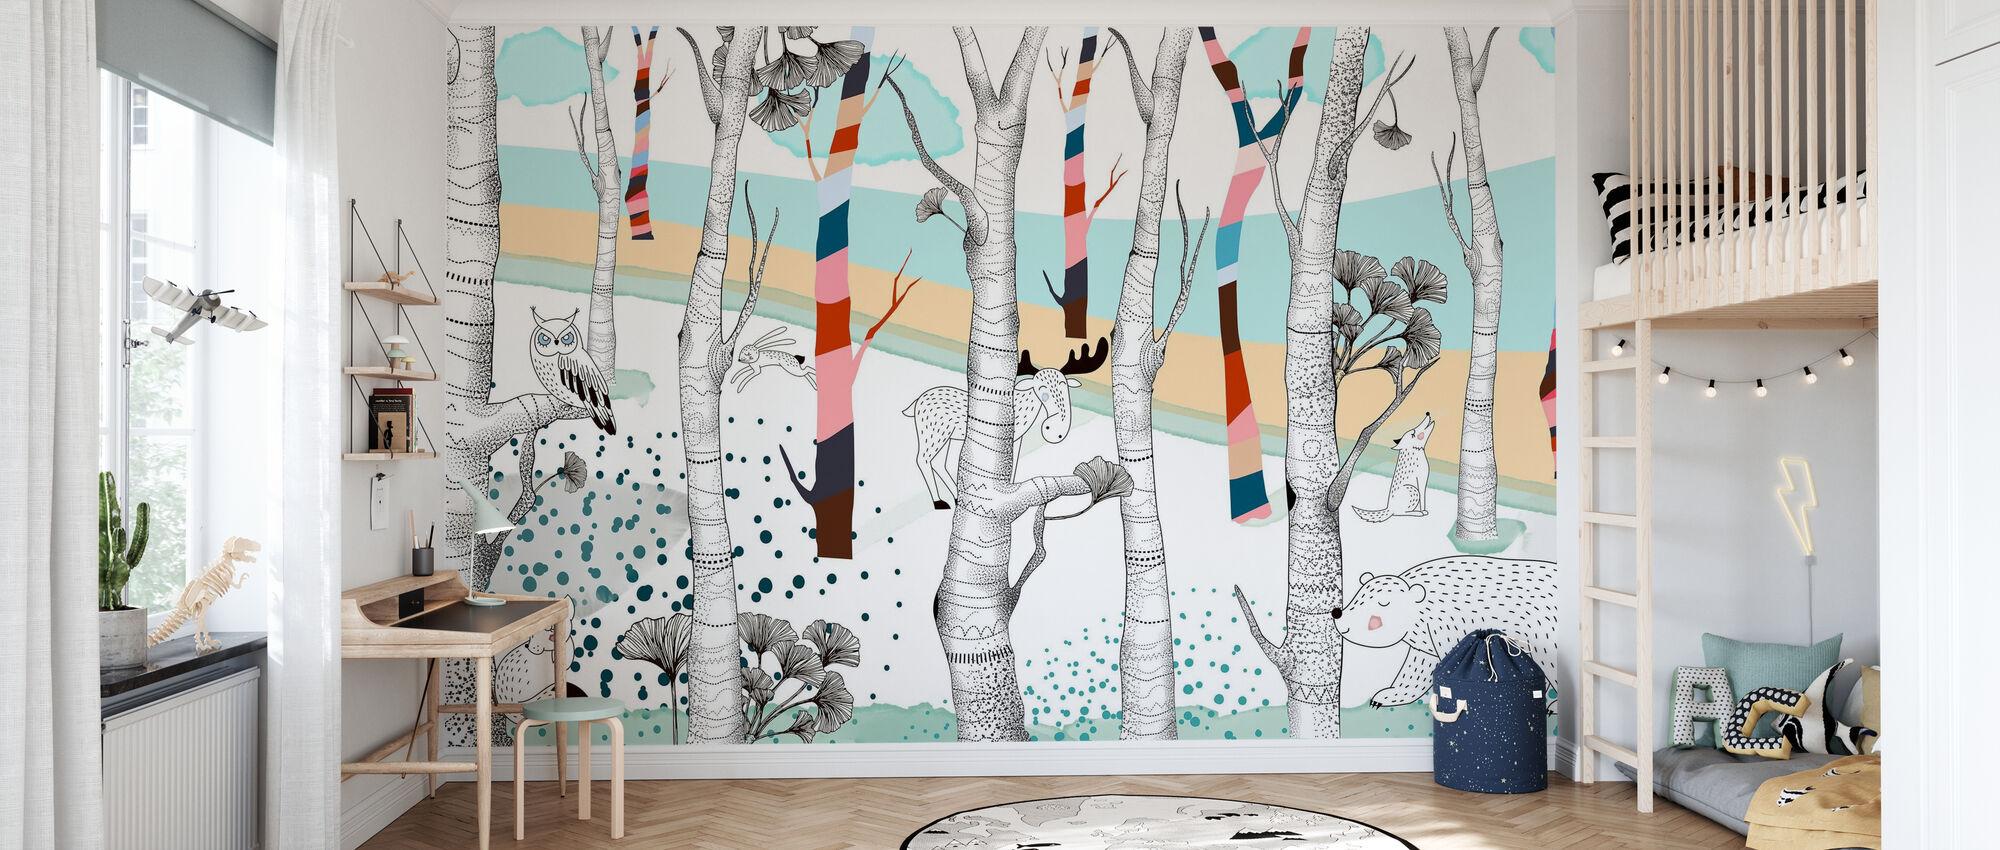 Woodland - Potpourri - Wallpaper - Kids Room